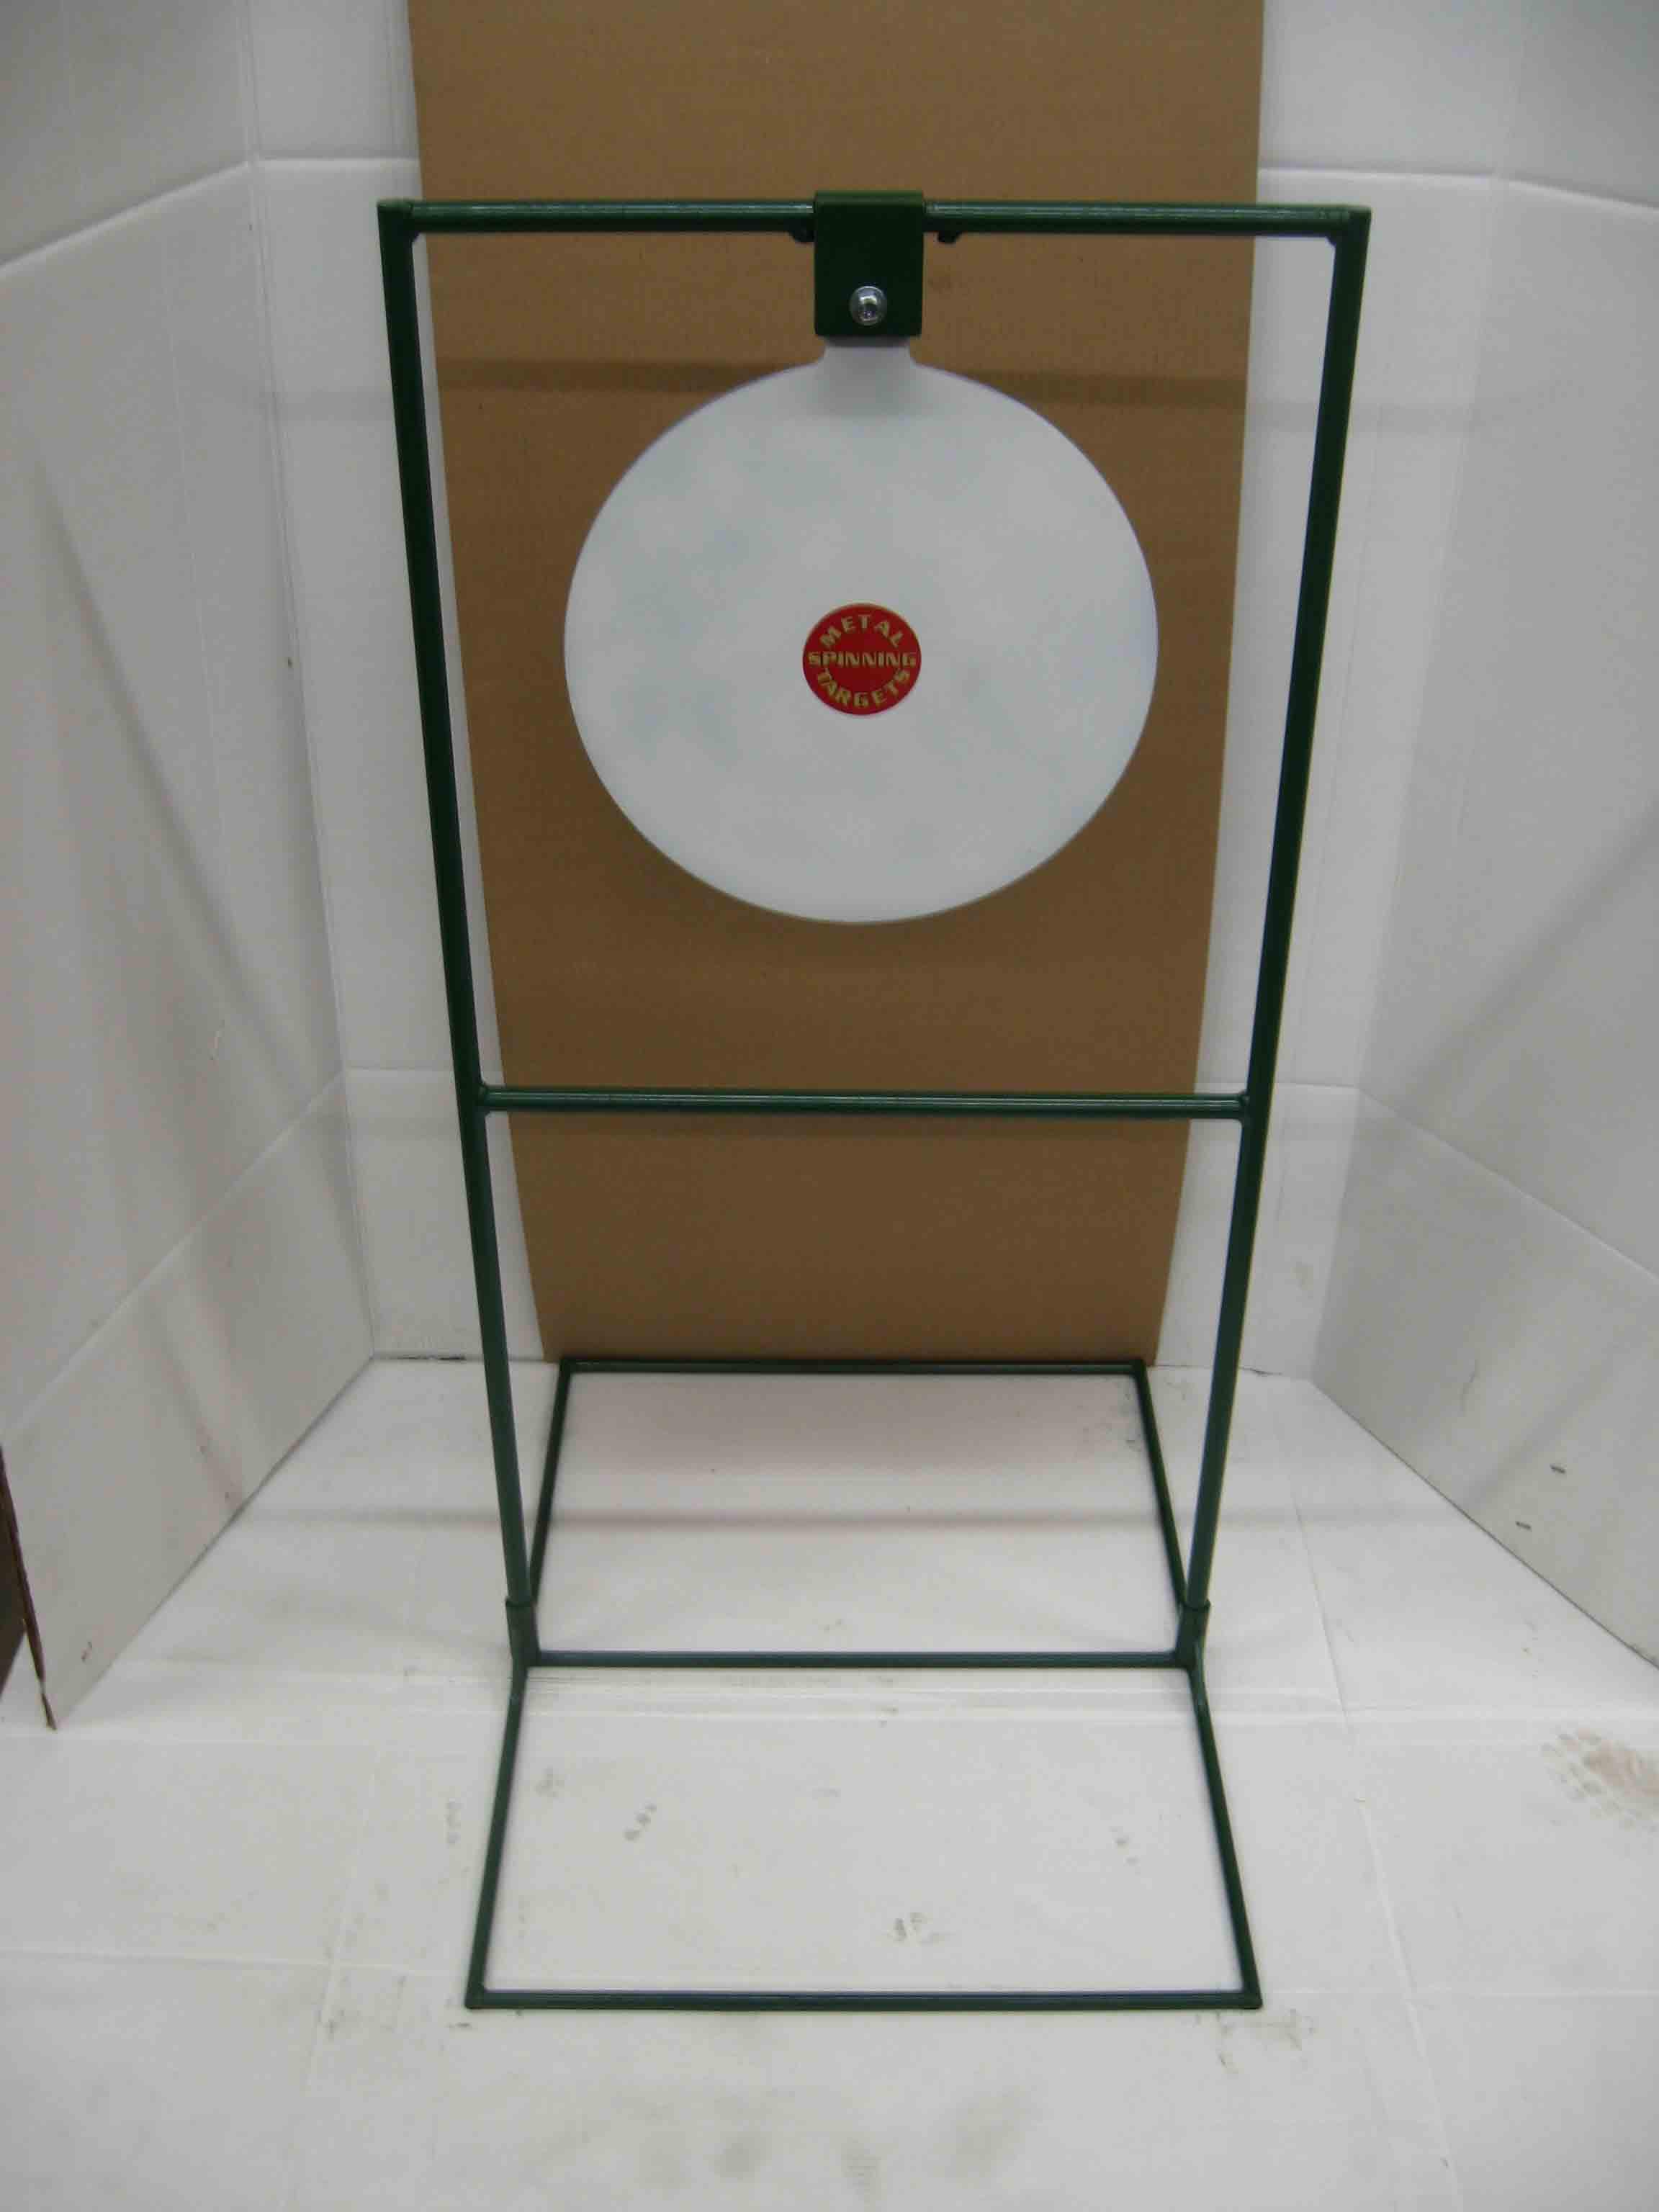 "15"" Circle Gong Tall Boy Target - Rifle Target Stands Displayed"